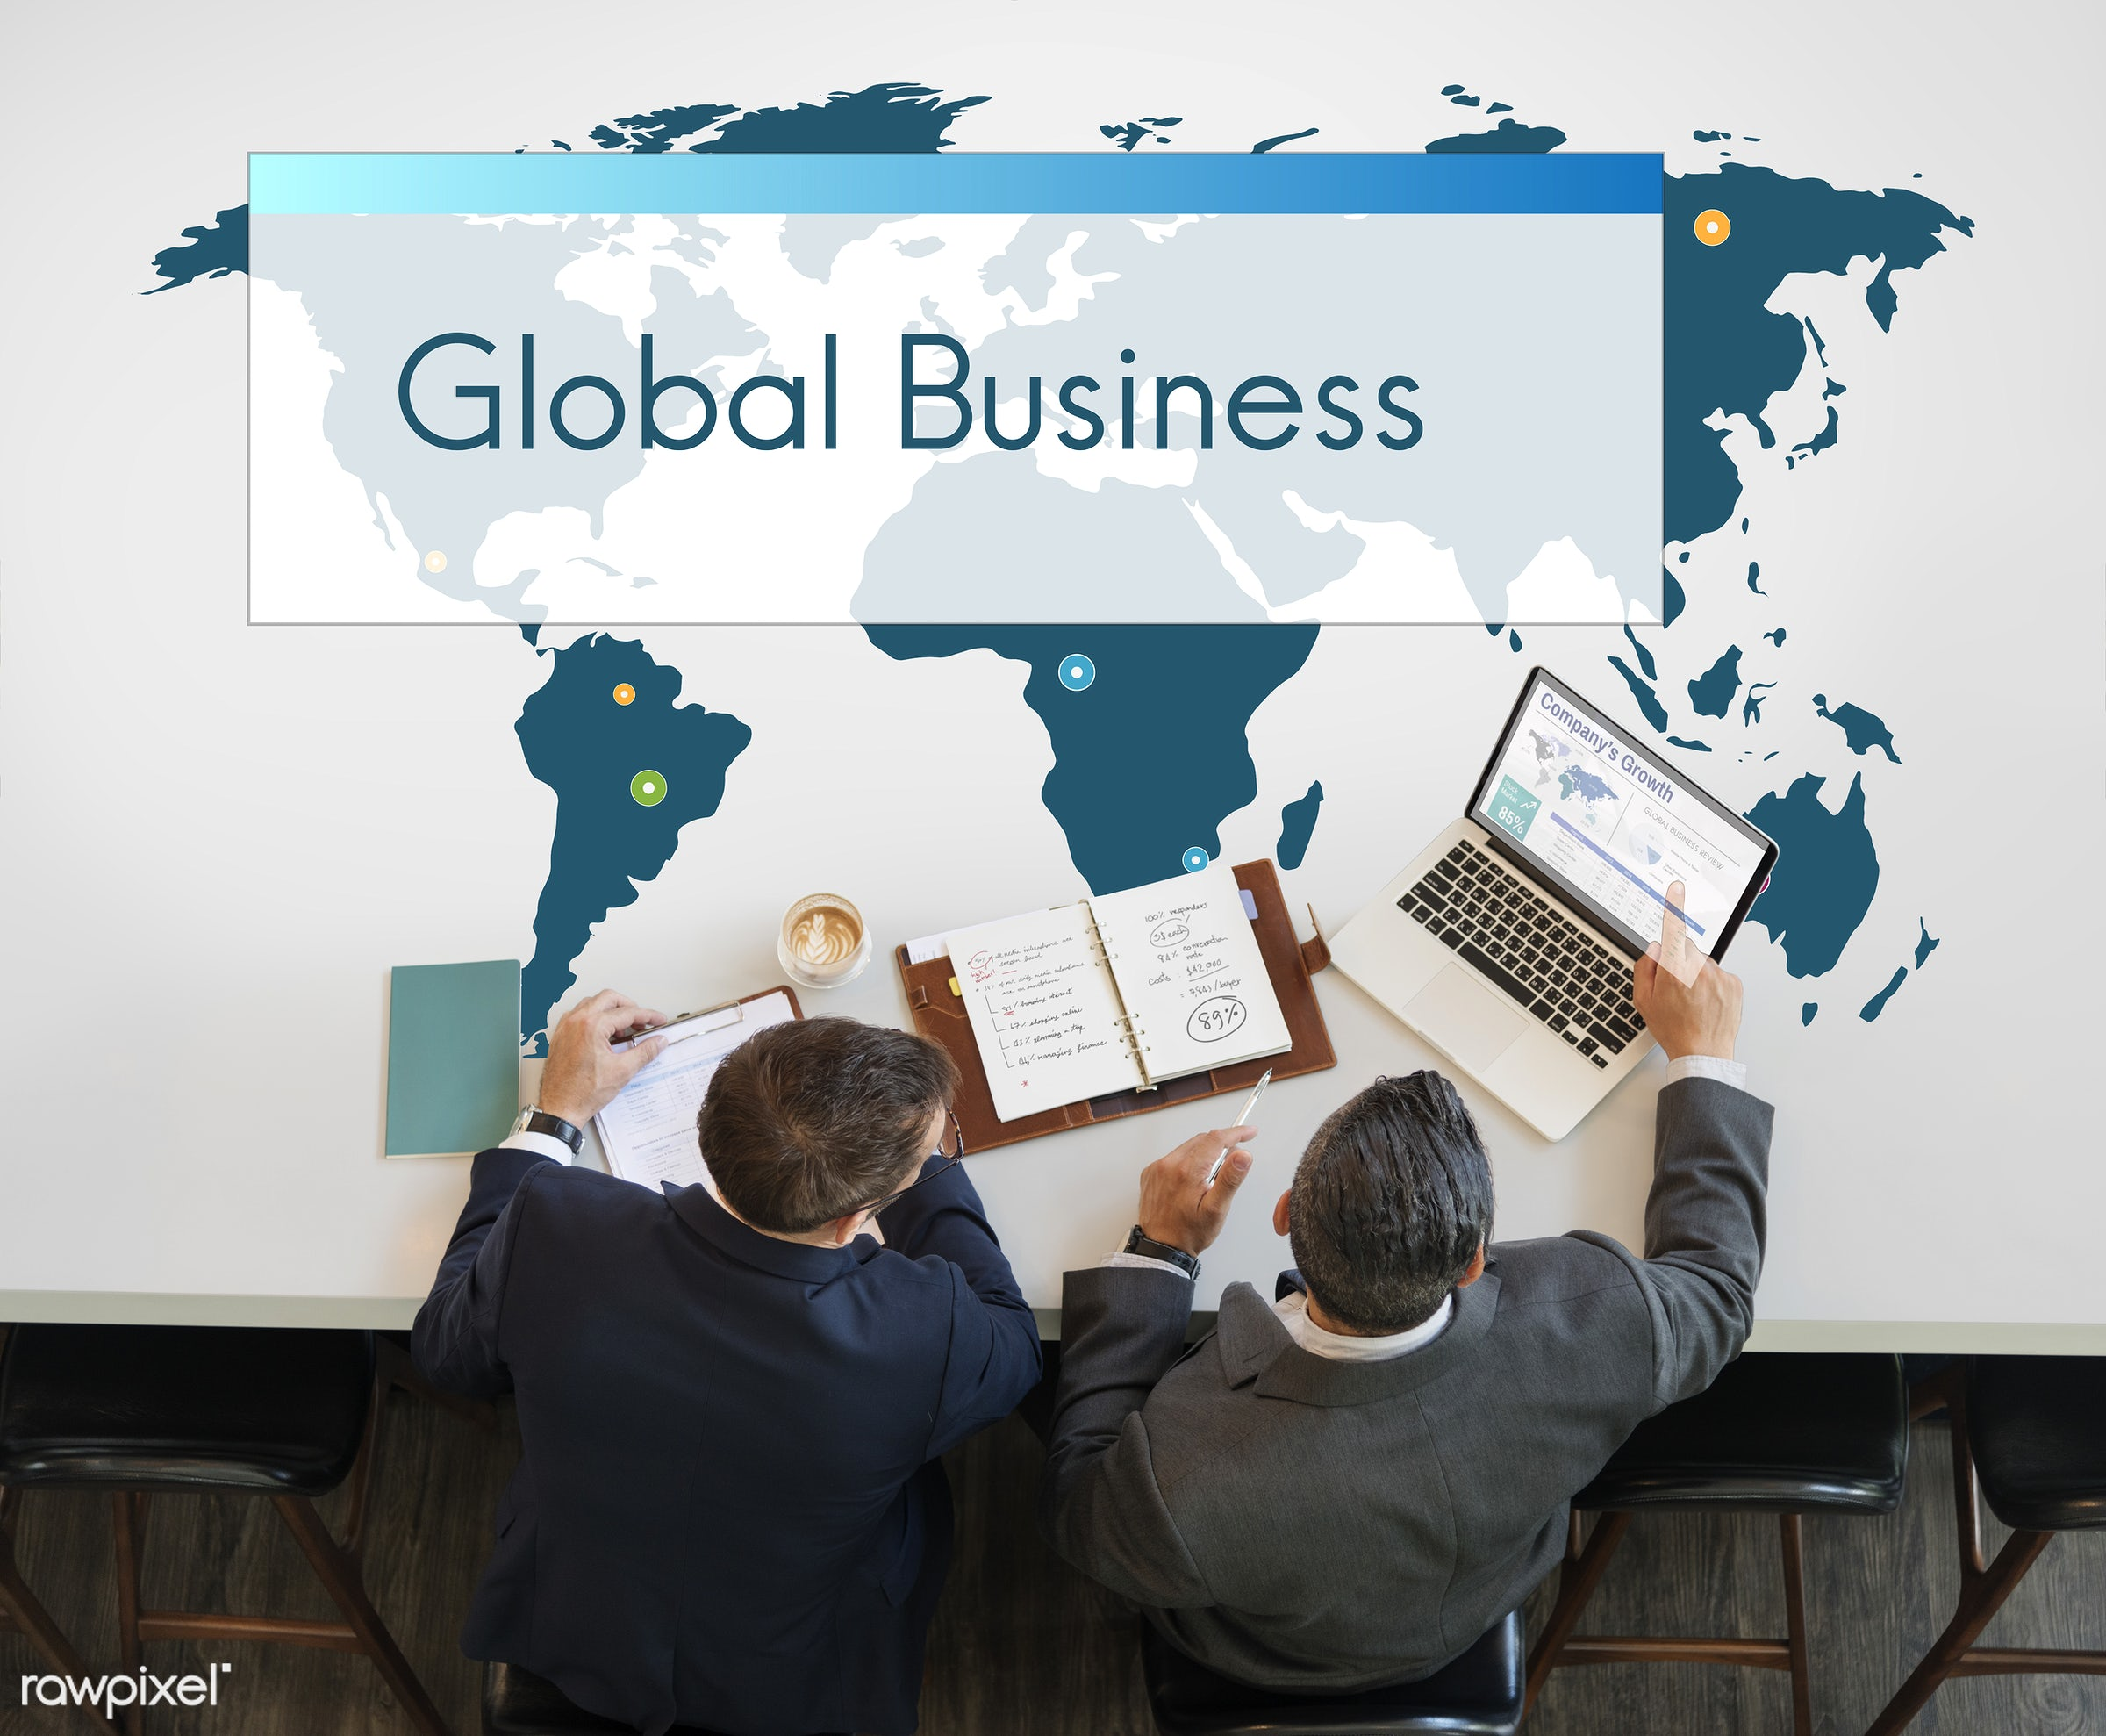 Global business - awareness, business, business improvement, businessman, businessmen, businessperson, calculator,...